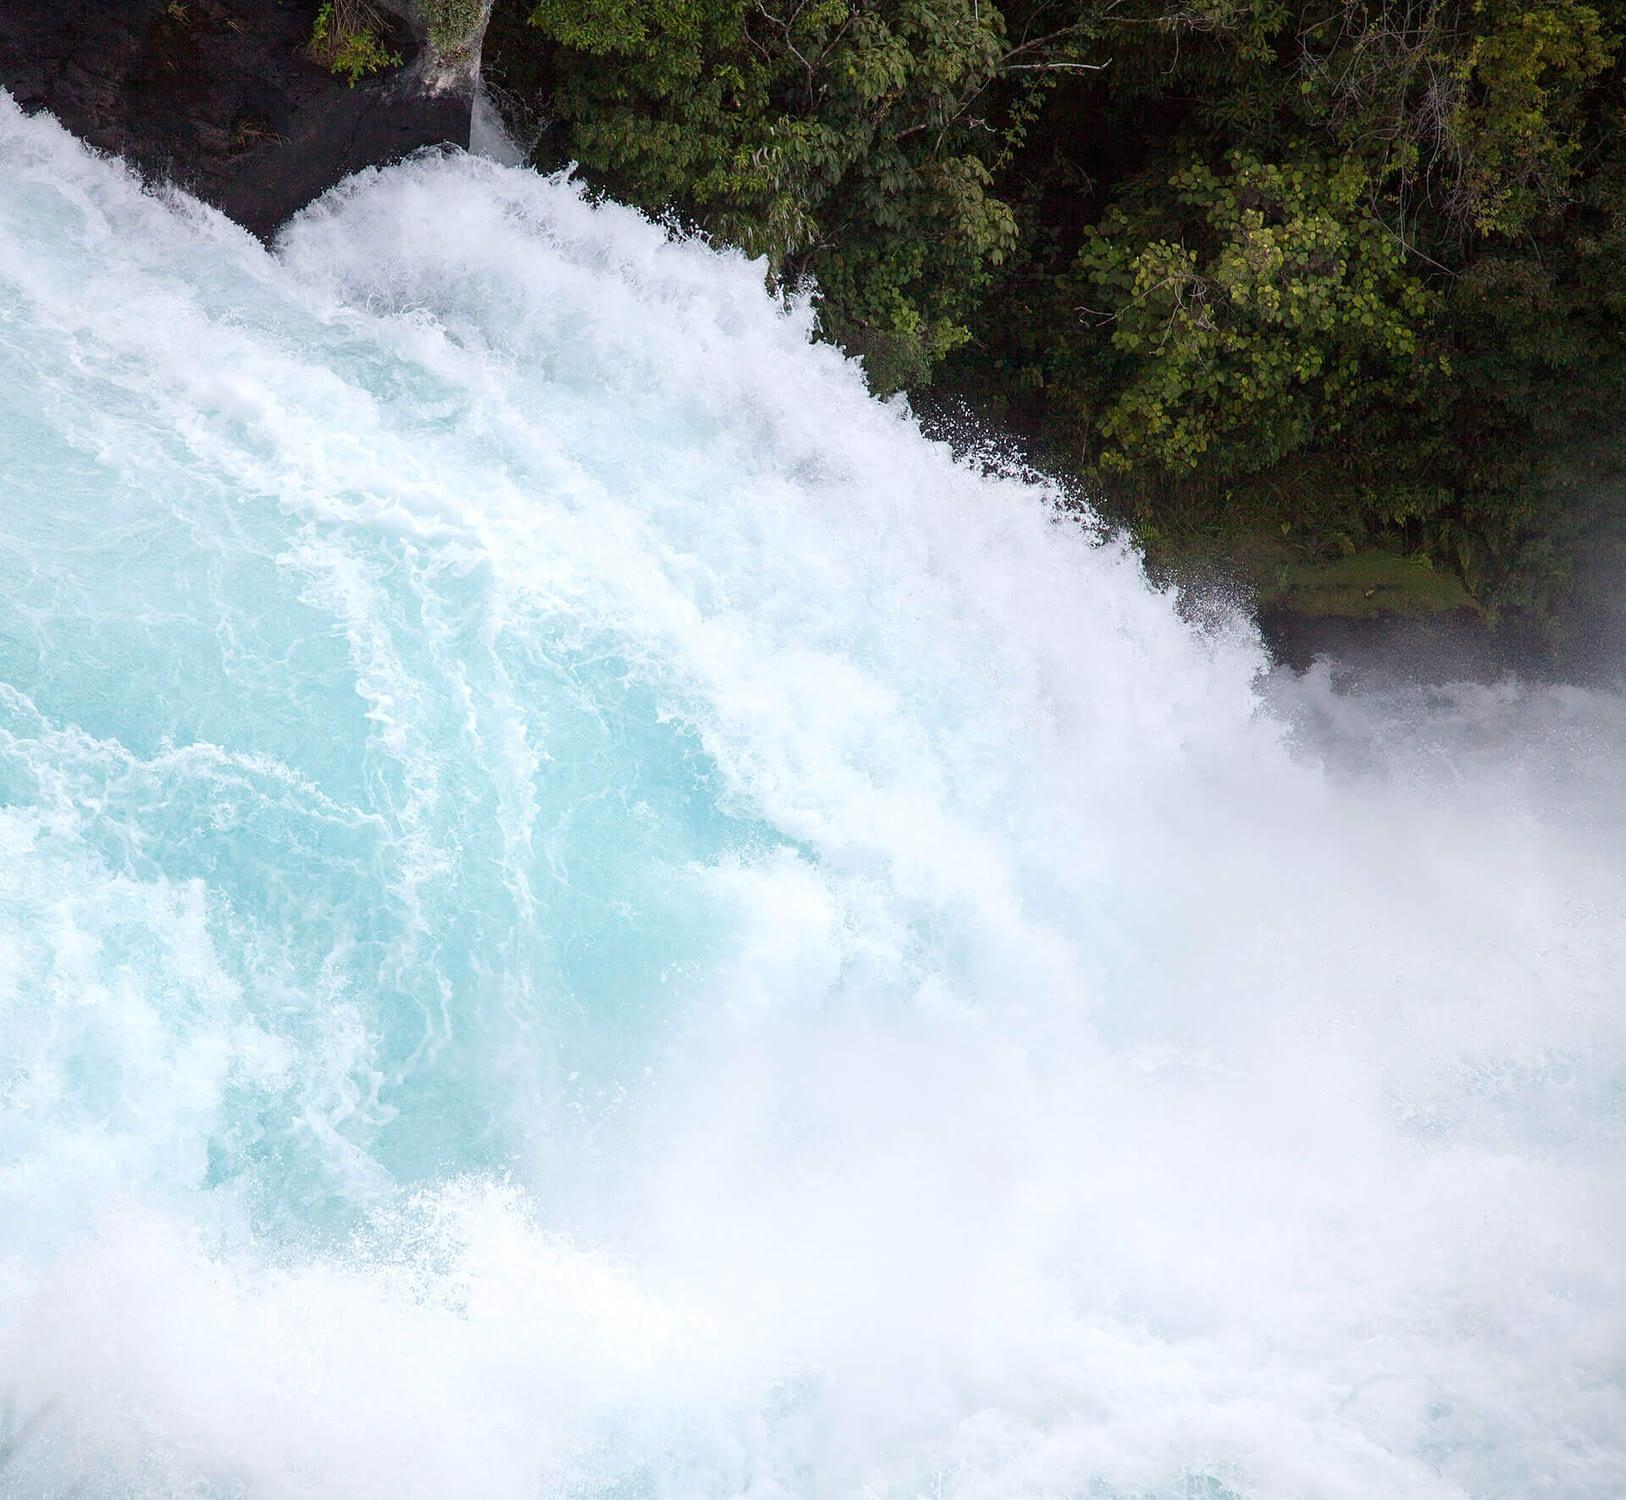 Atemtherapie Wasserfall